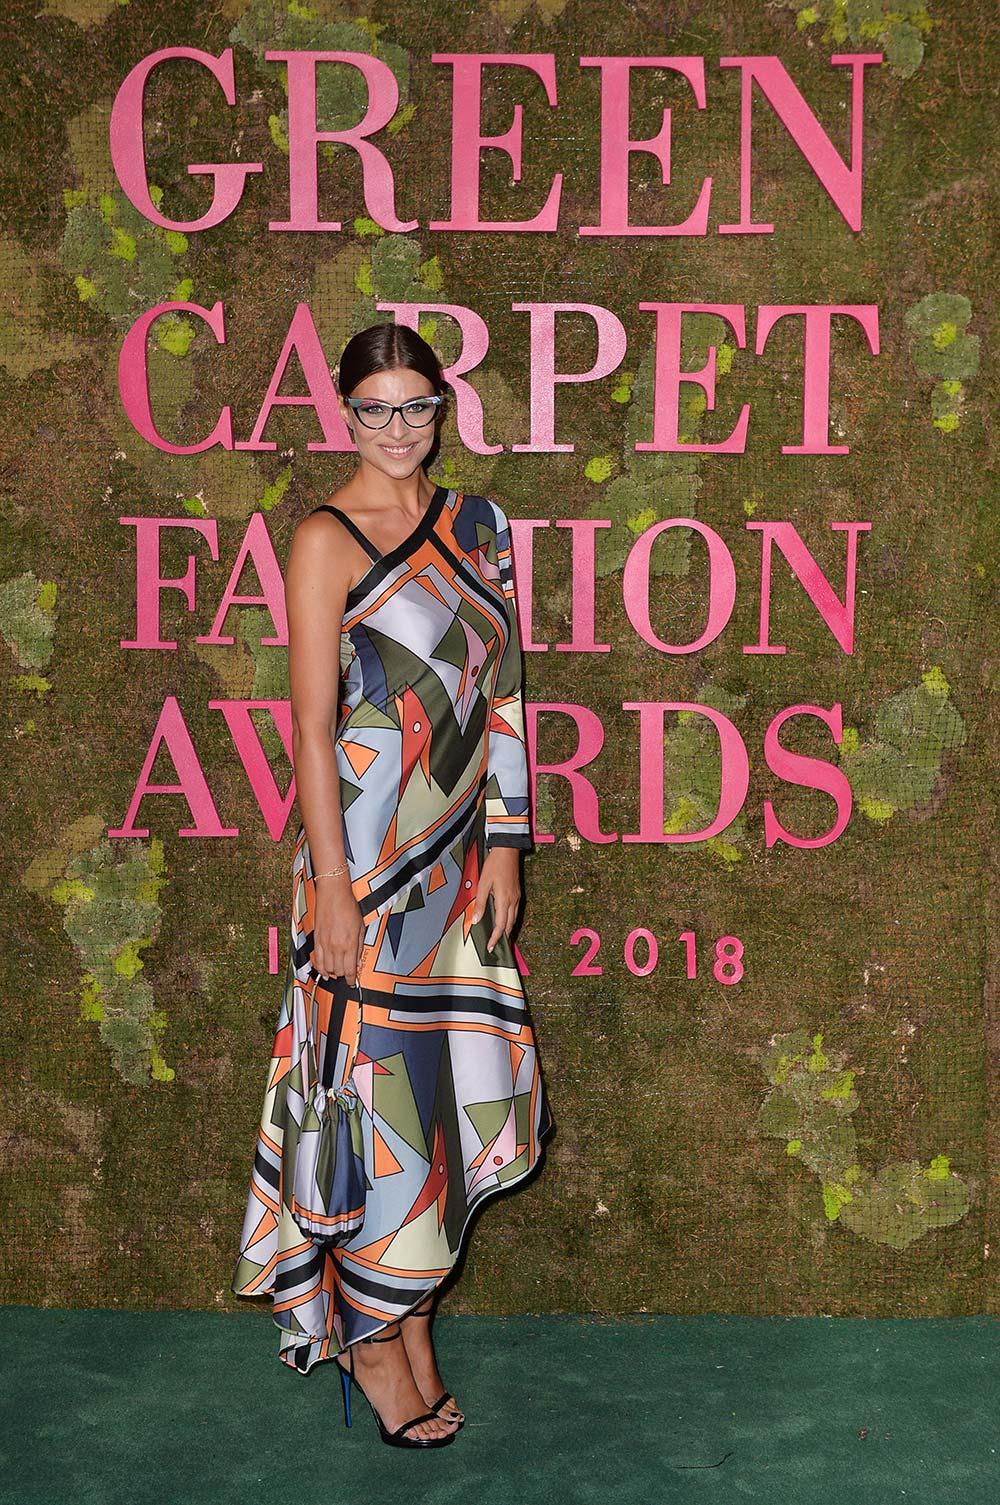 Green Carpet Fashion Awards 2018 - Cristina Chiabotto - Hair & Makeup Massimo Serini